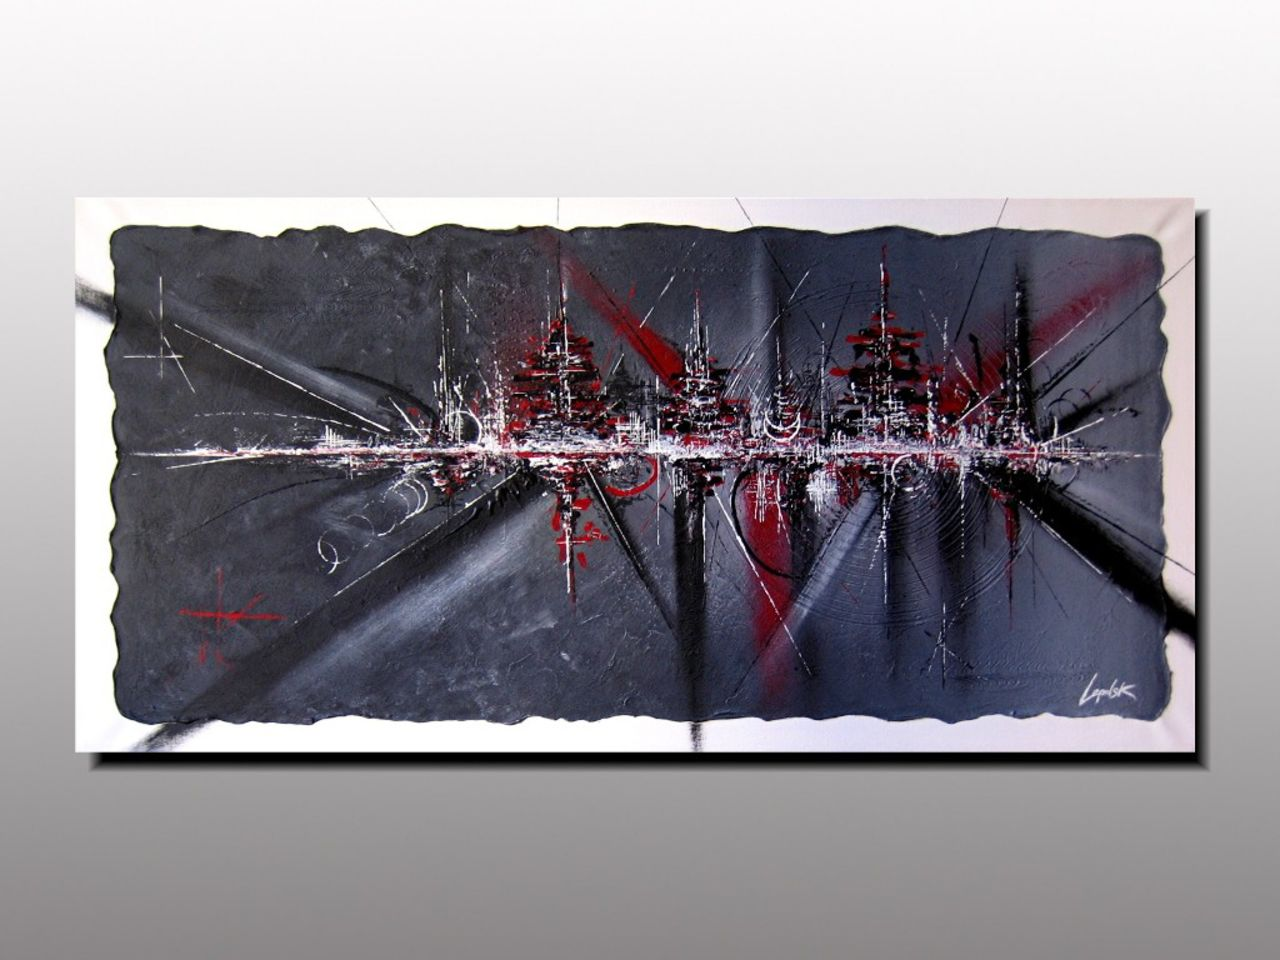 MISTER K  (Lepolsk Matuszewski) PAPILLON  Art abstrait contemporain